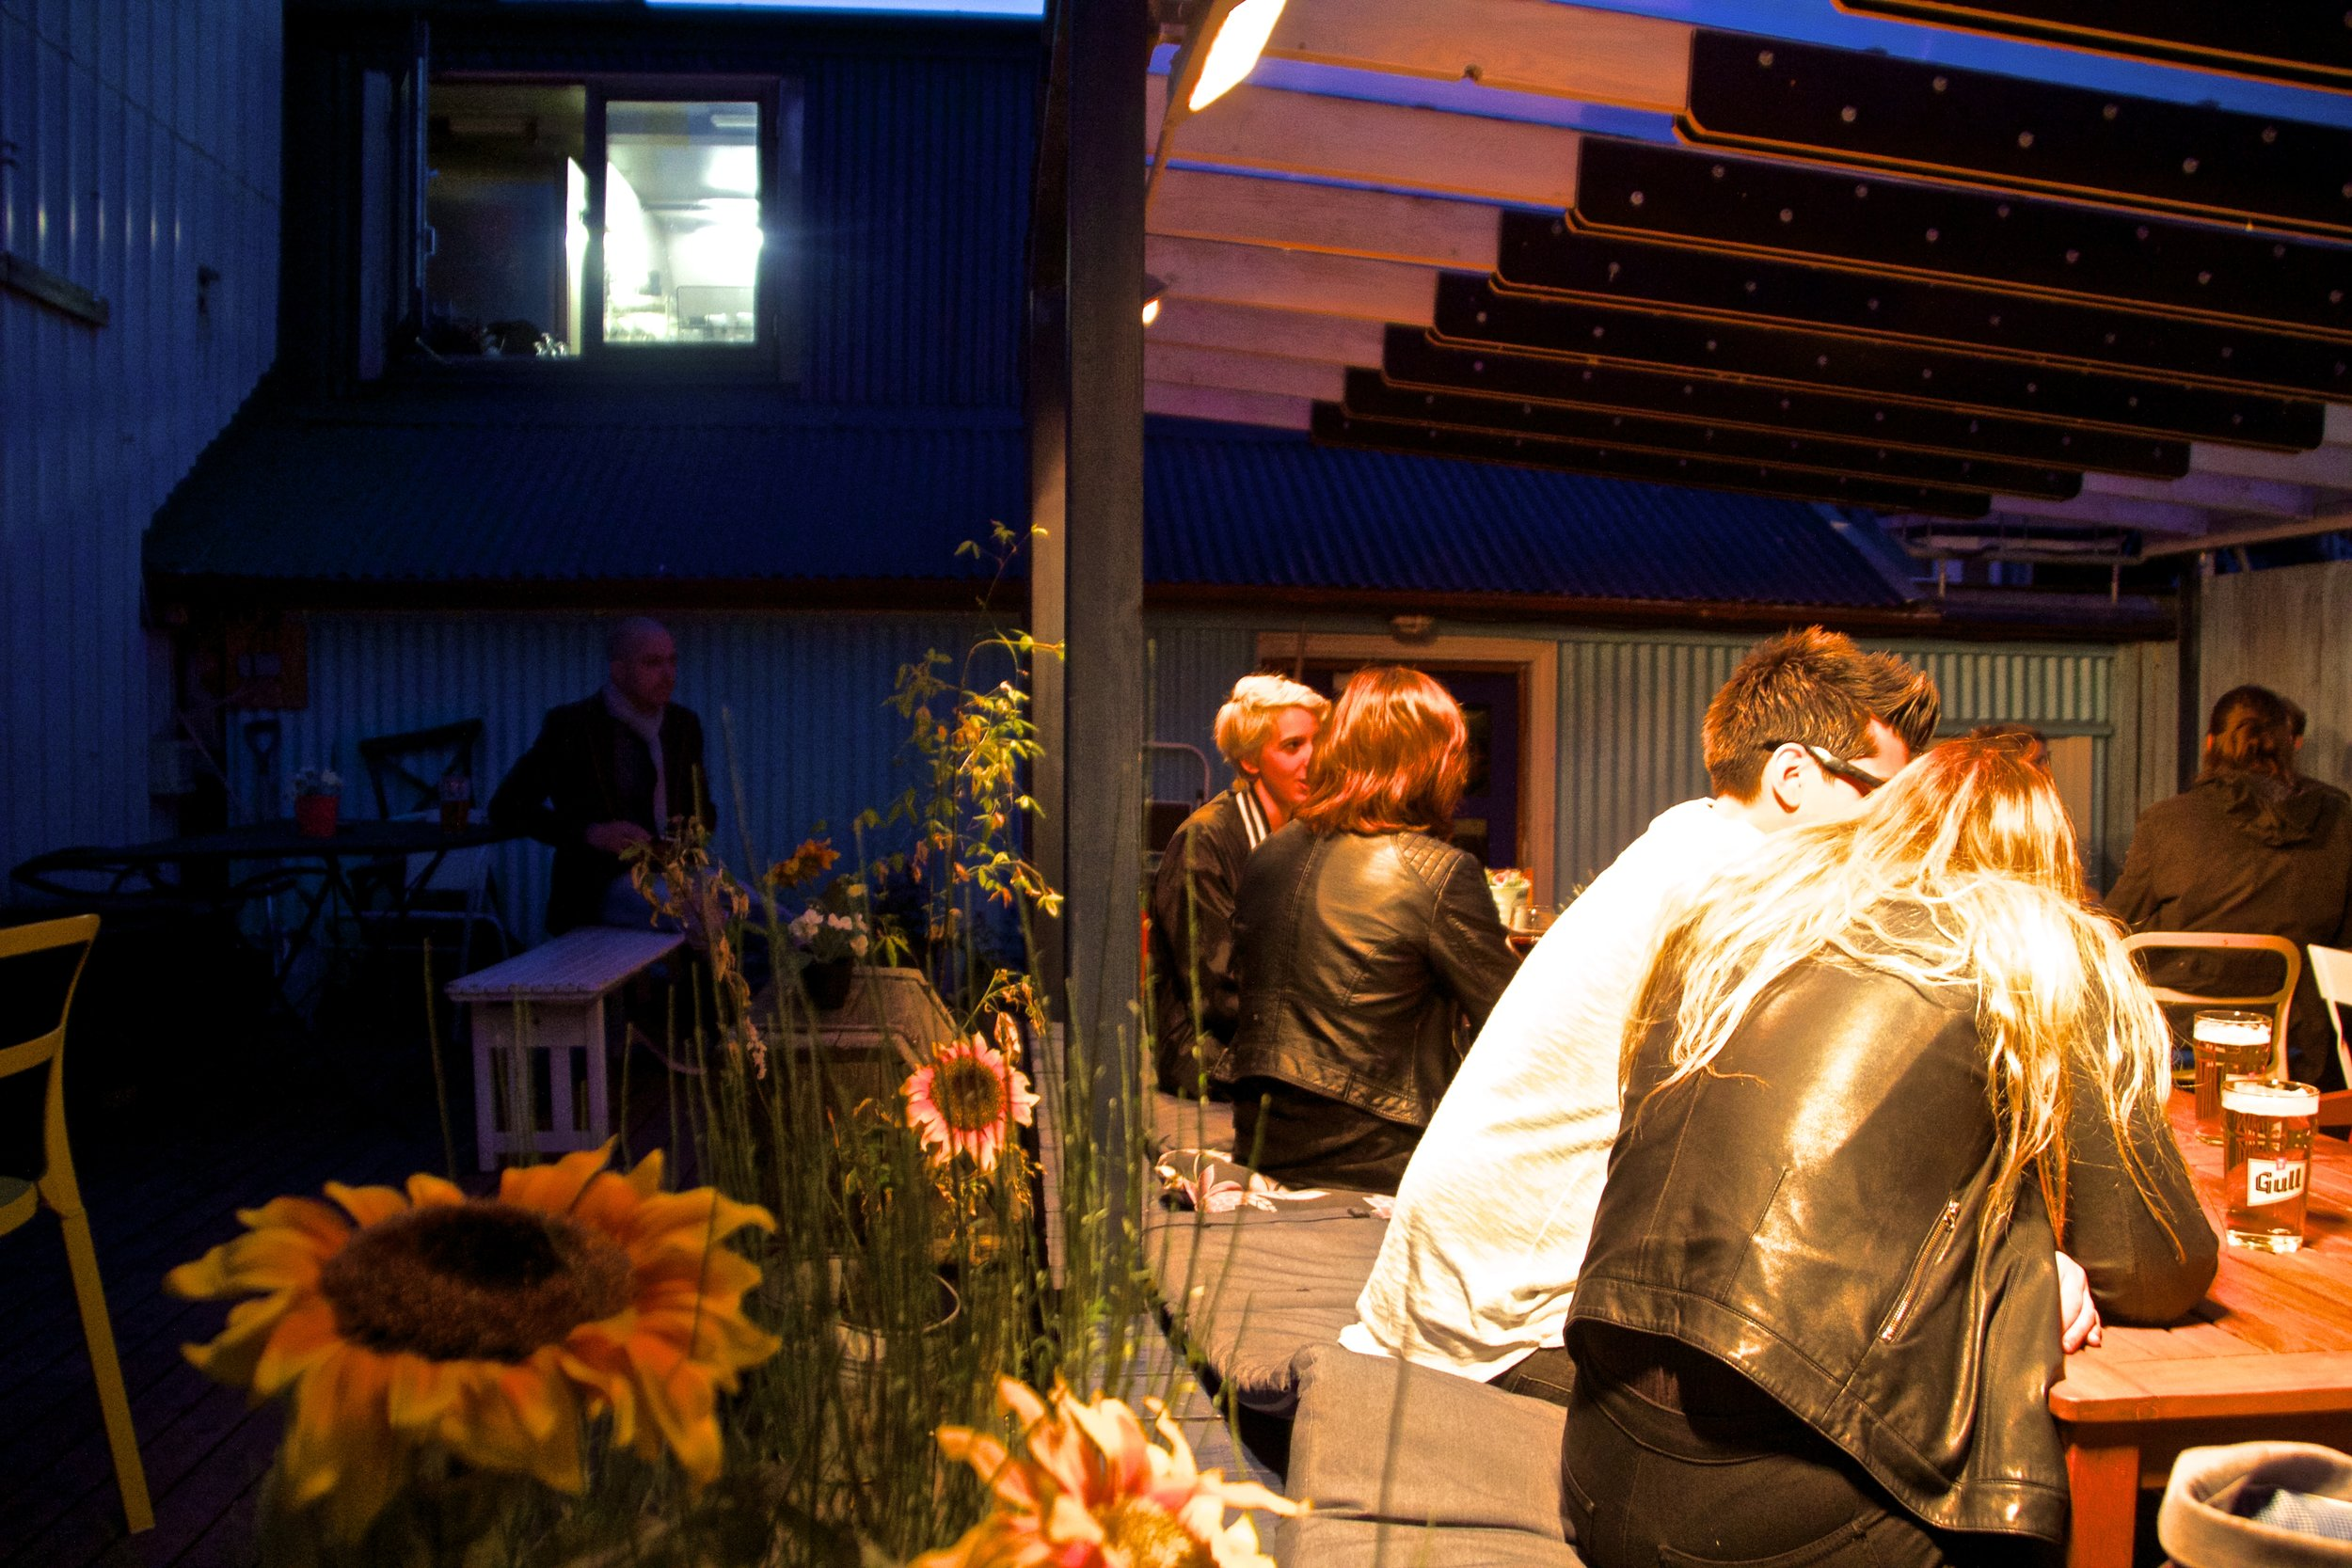 reykjavik nightlife boston bar 2.jpg